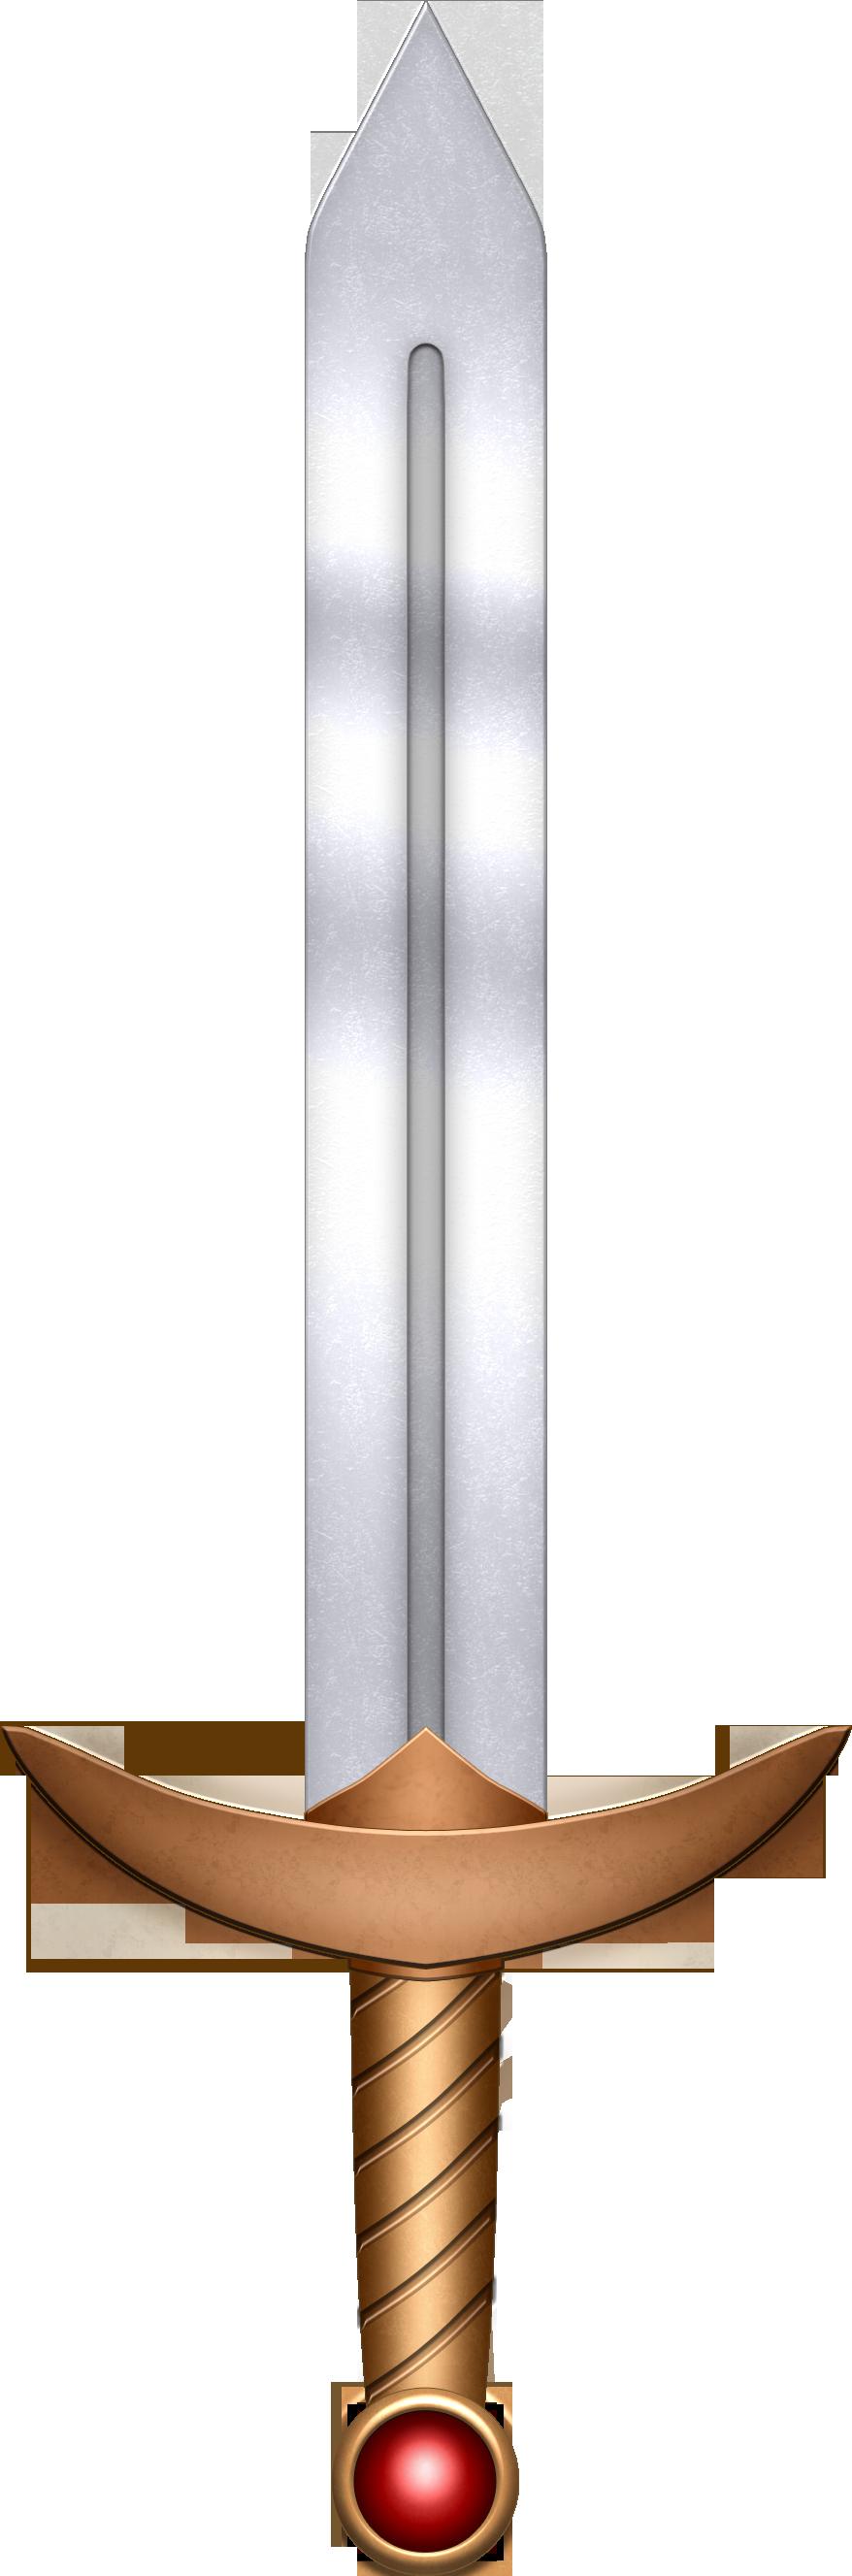 AOL Sword